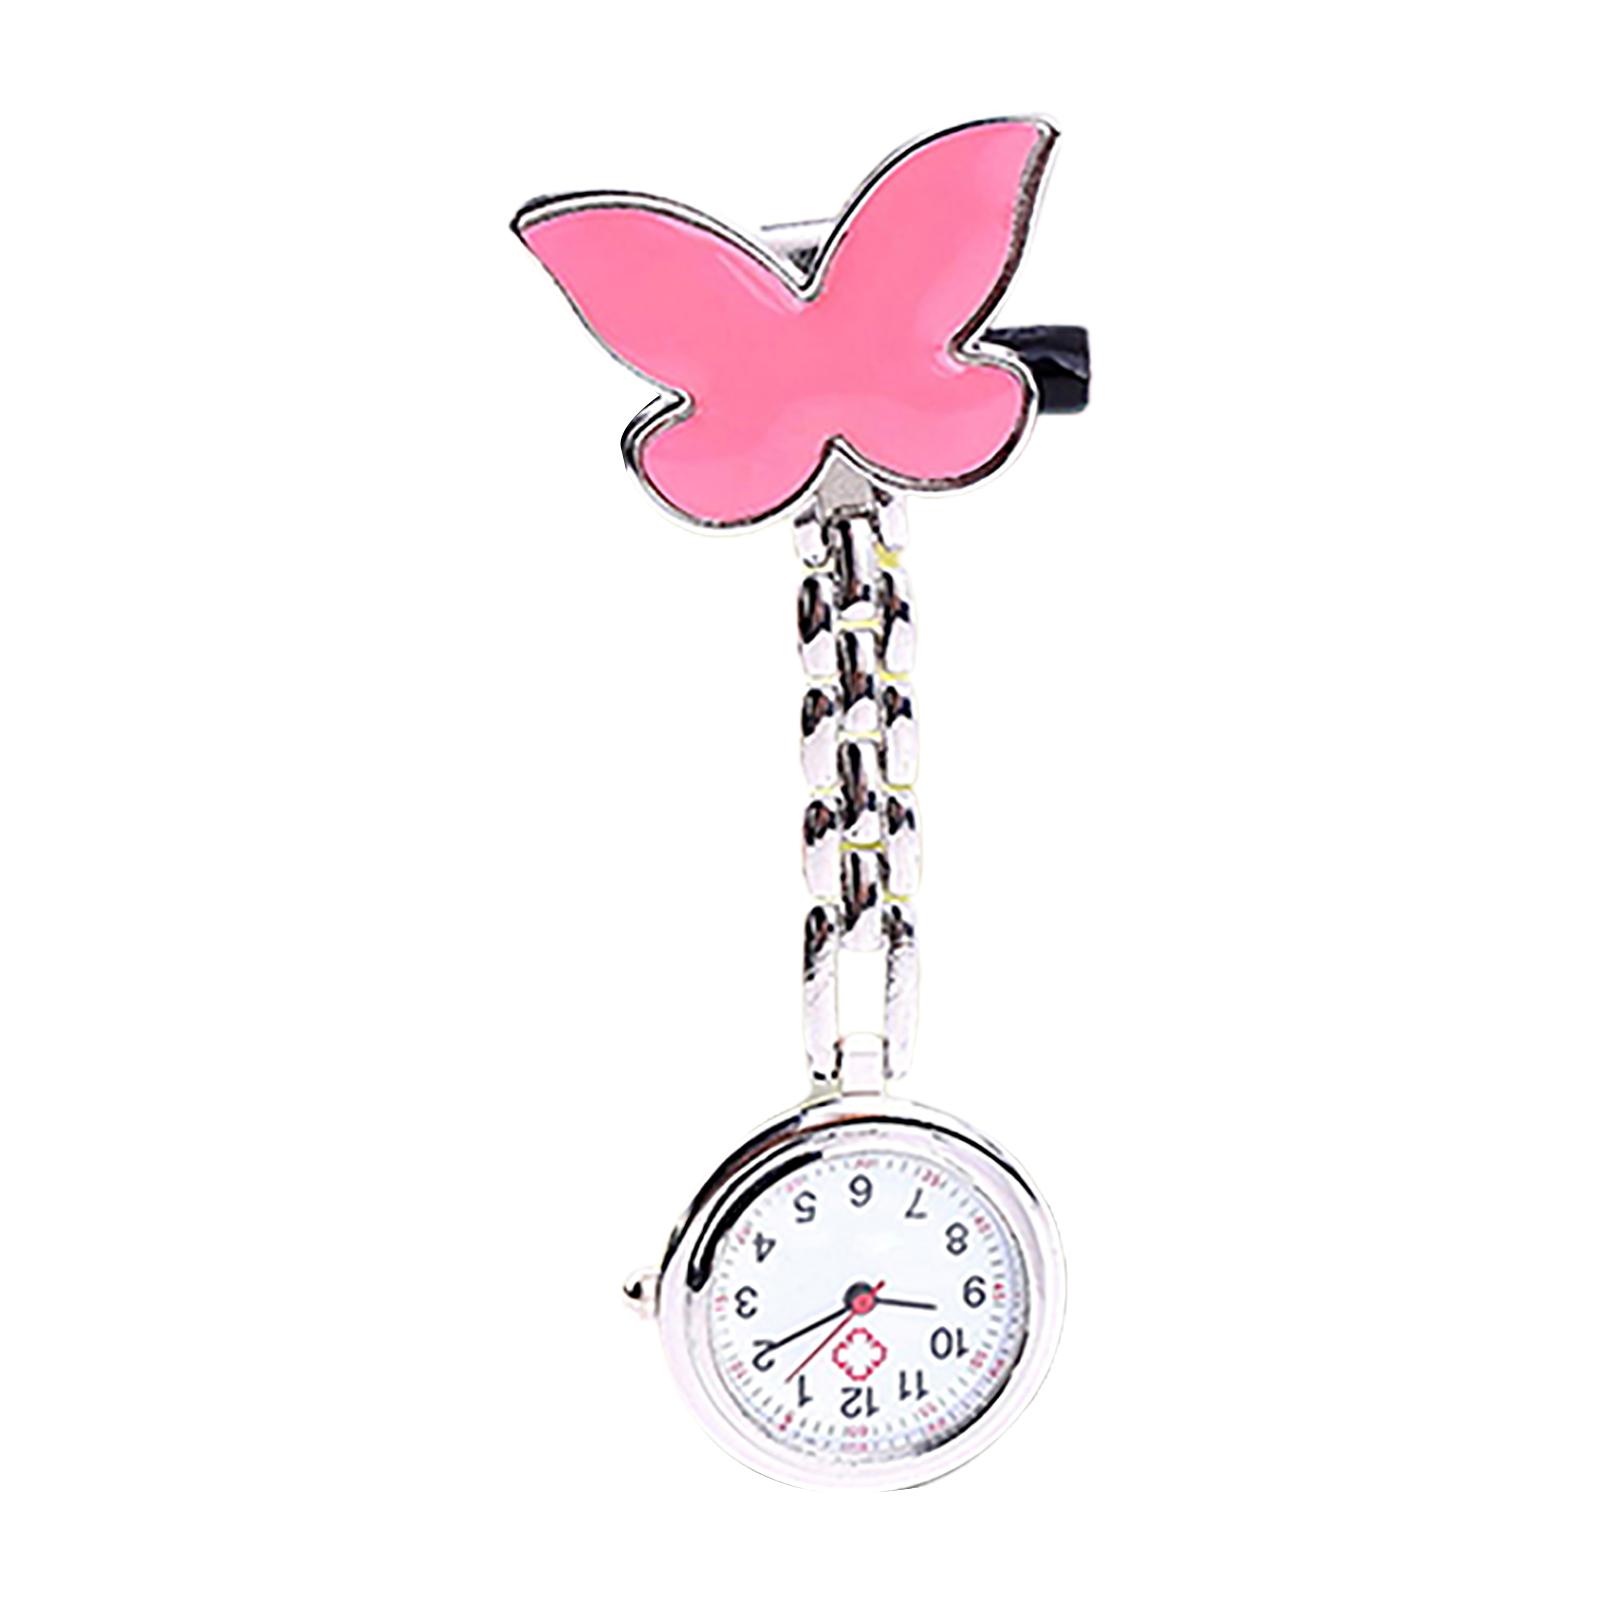 Women-Butterfly-Smile-Face-Analog-Quartz-Clip-On-Brooch-Pocket-Nurse-Watch-Hot thumbnail 27